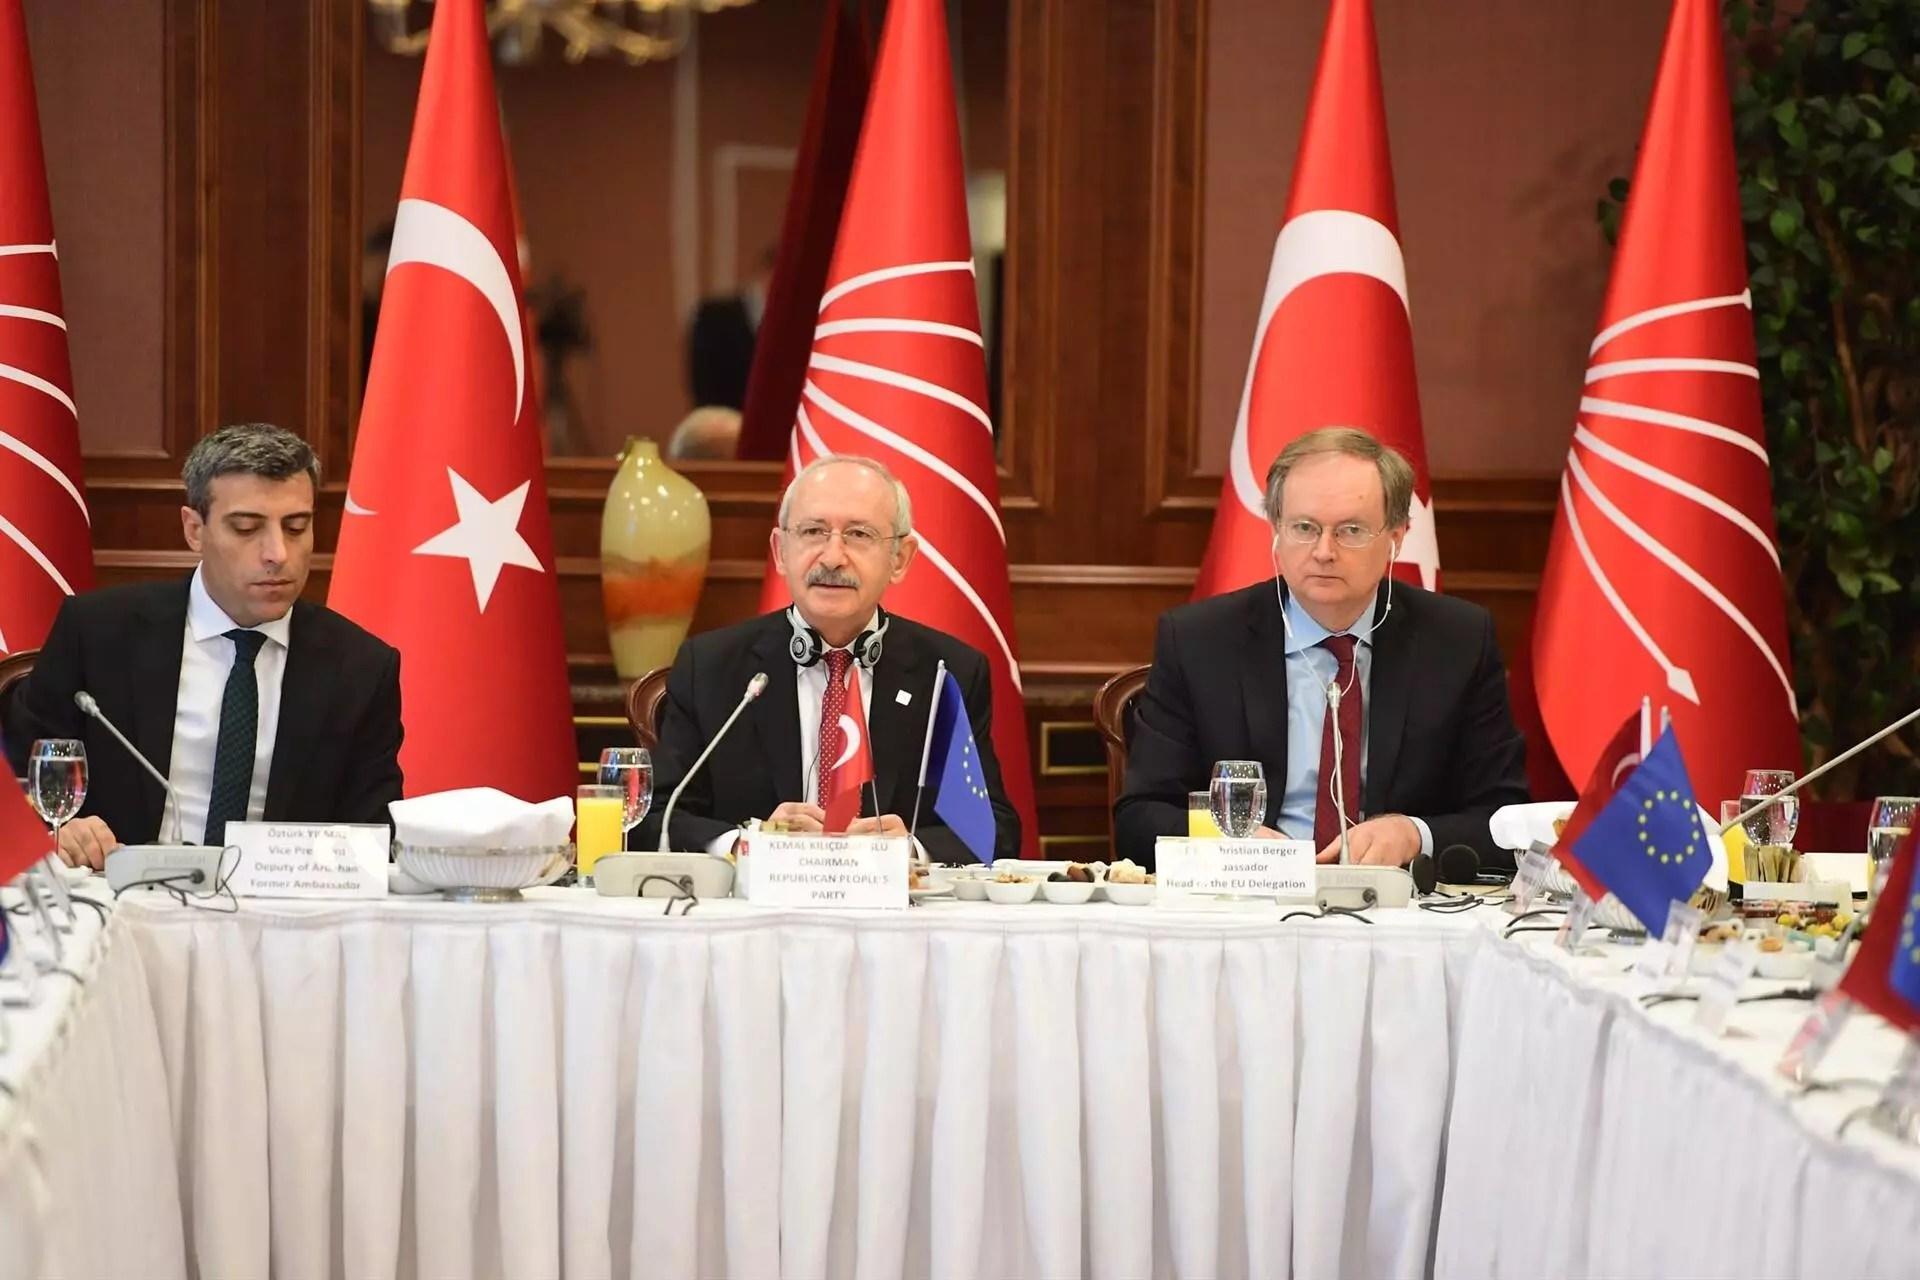 Main opposition CHP leader Kılıçdaroğlu meets EU ambassadors in Ankara